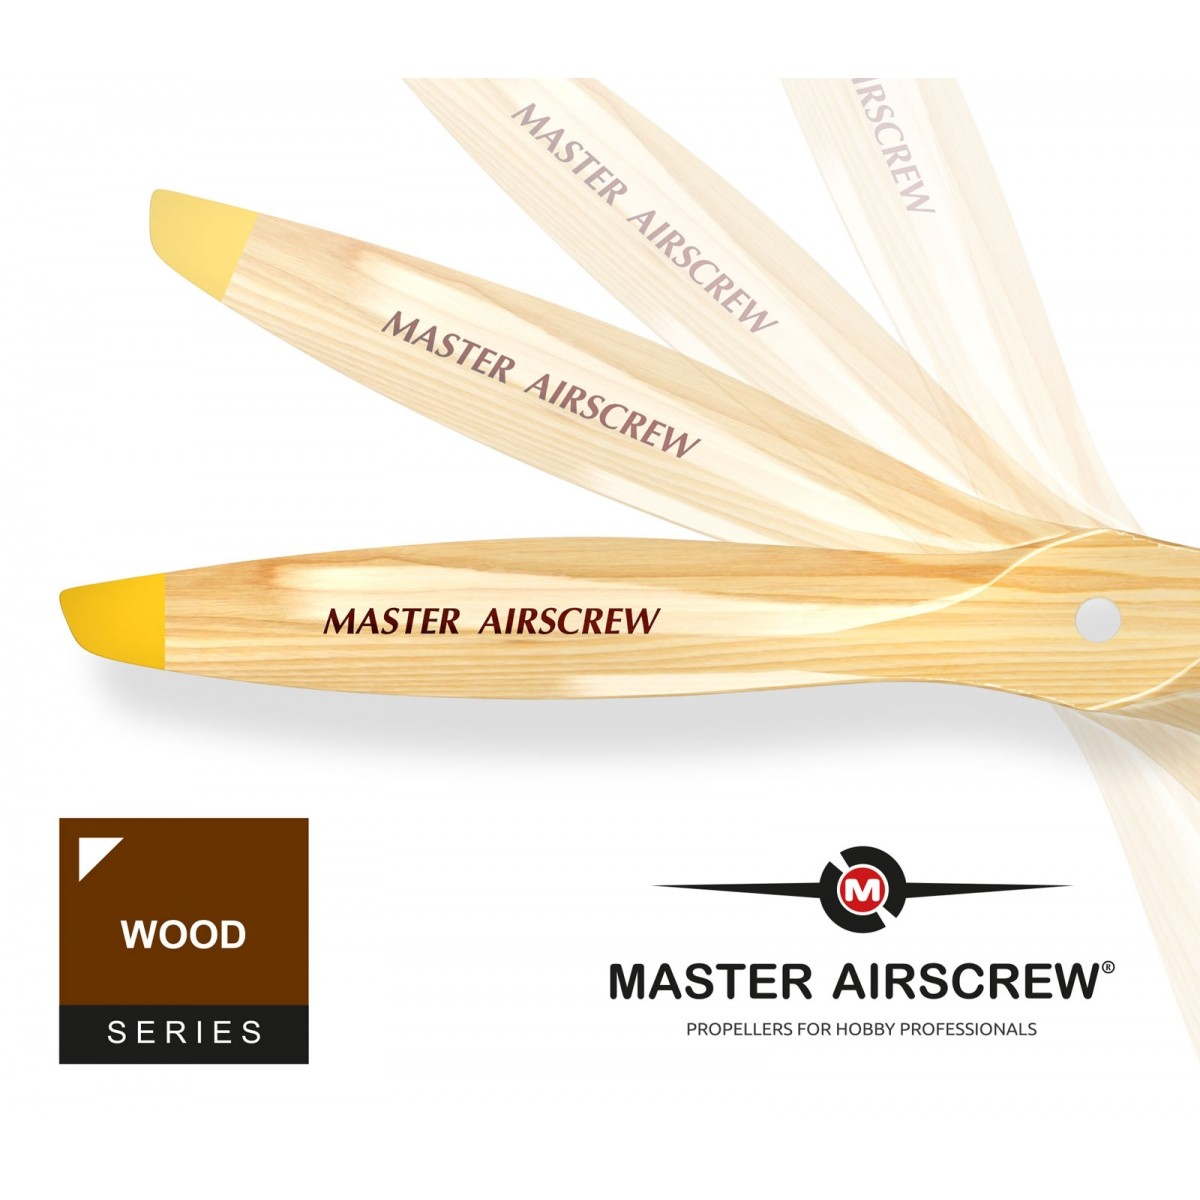 MA1660B - Hélice Master Airscrew Wood Series 16X6